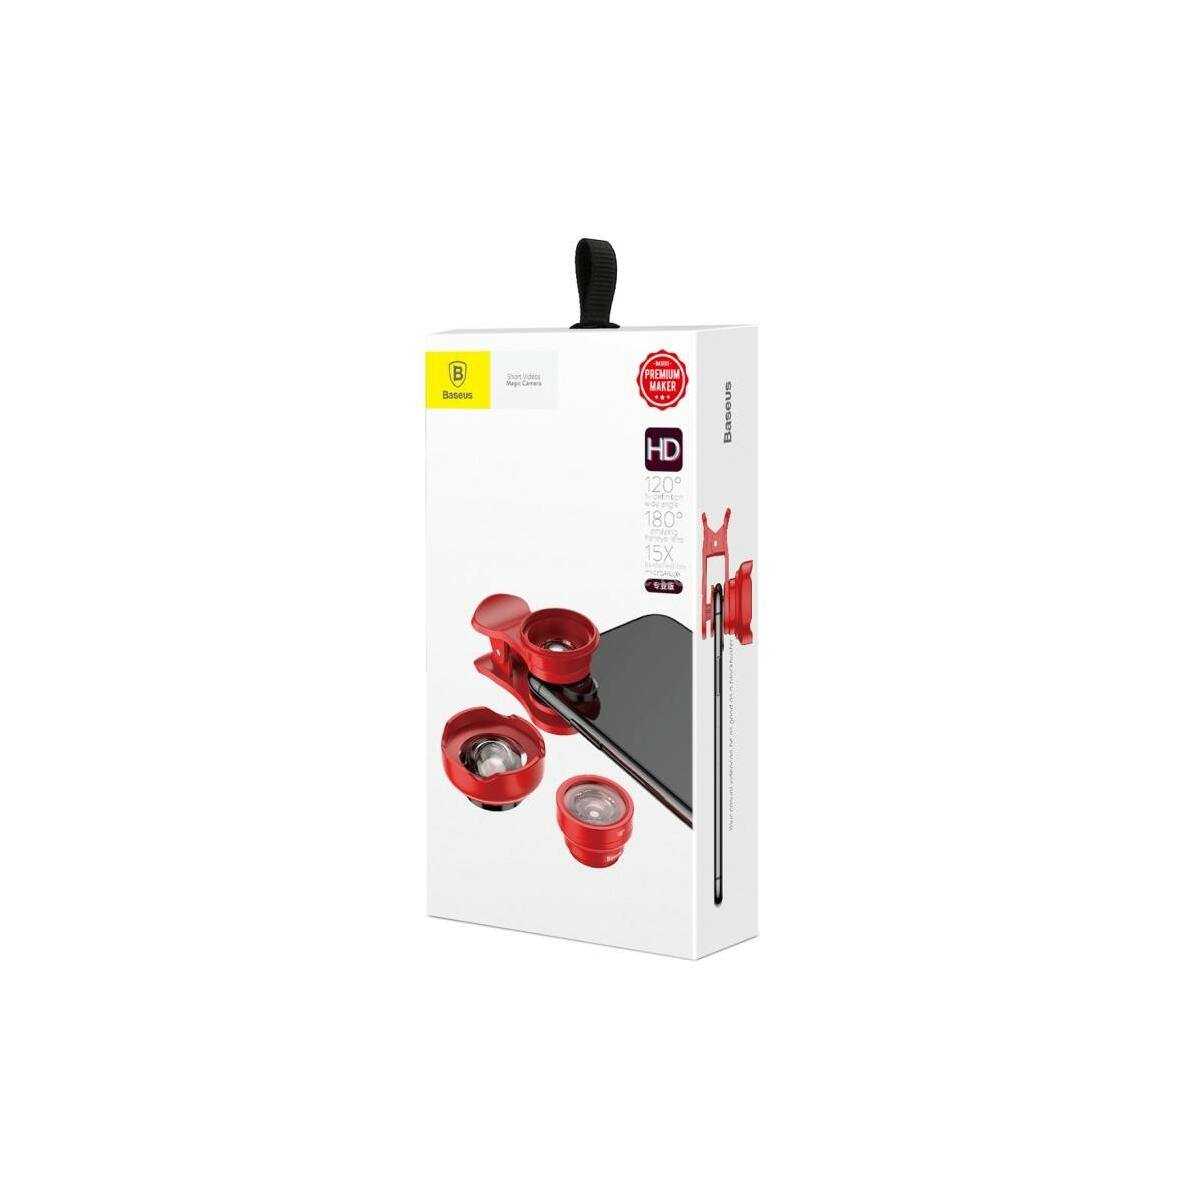 Baseus kamera optika mobilhoz Short Videos Magic (Hi-definition), piros (ACSXT-A09)